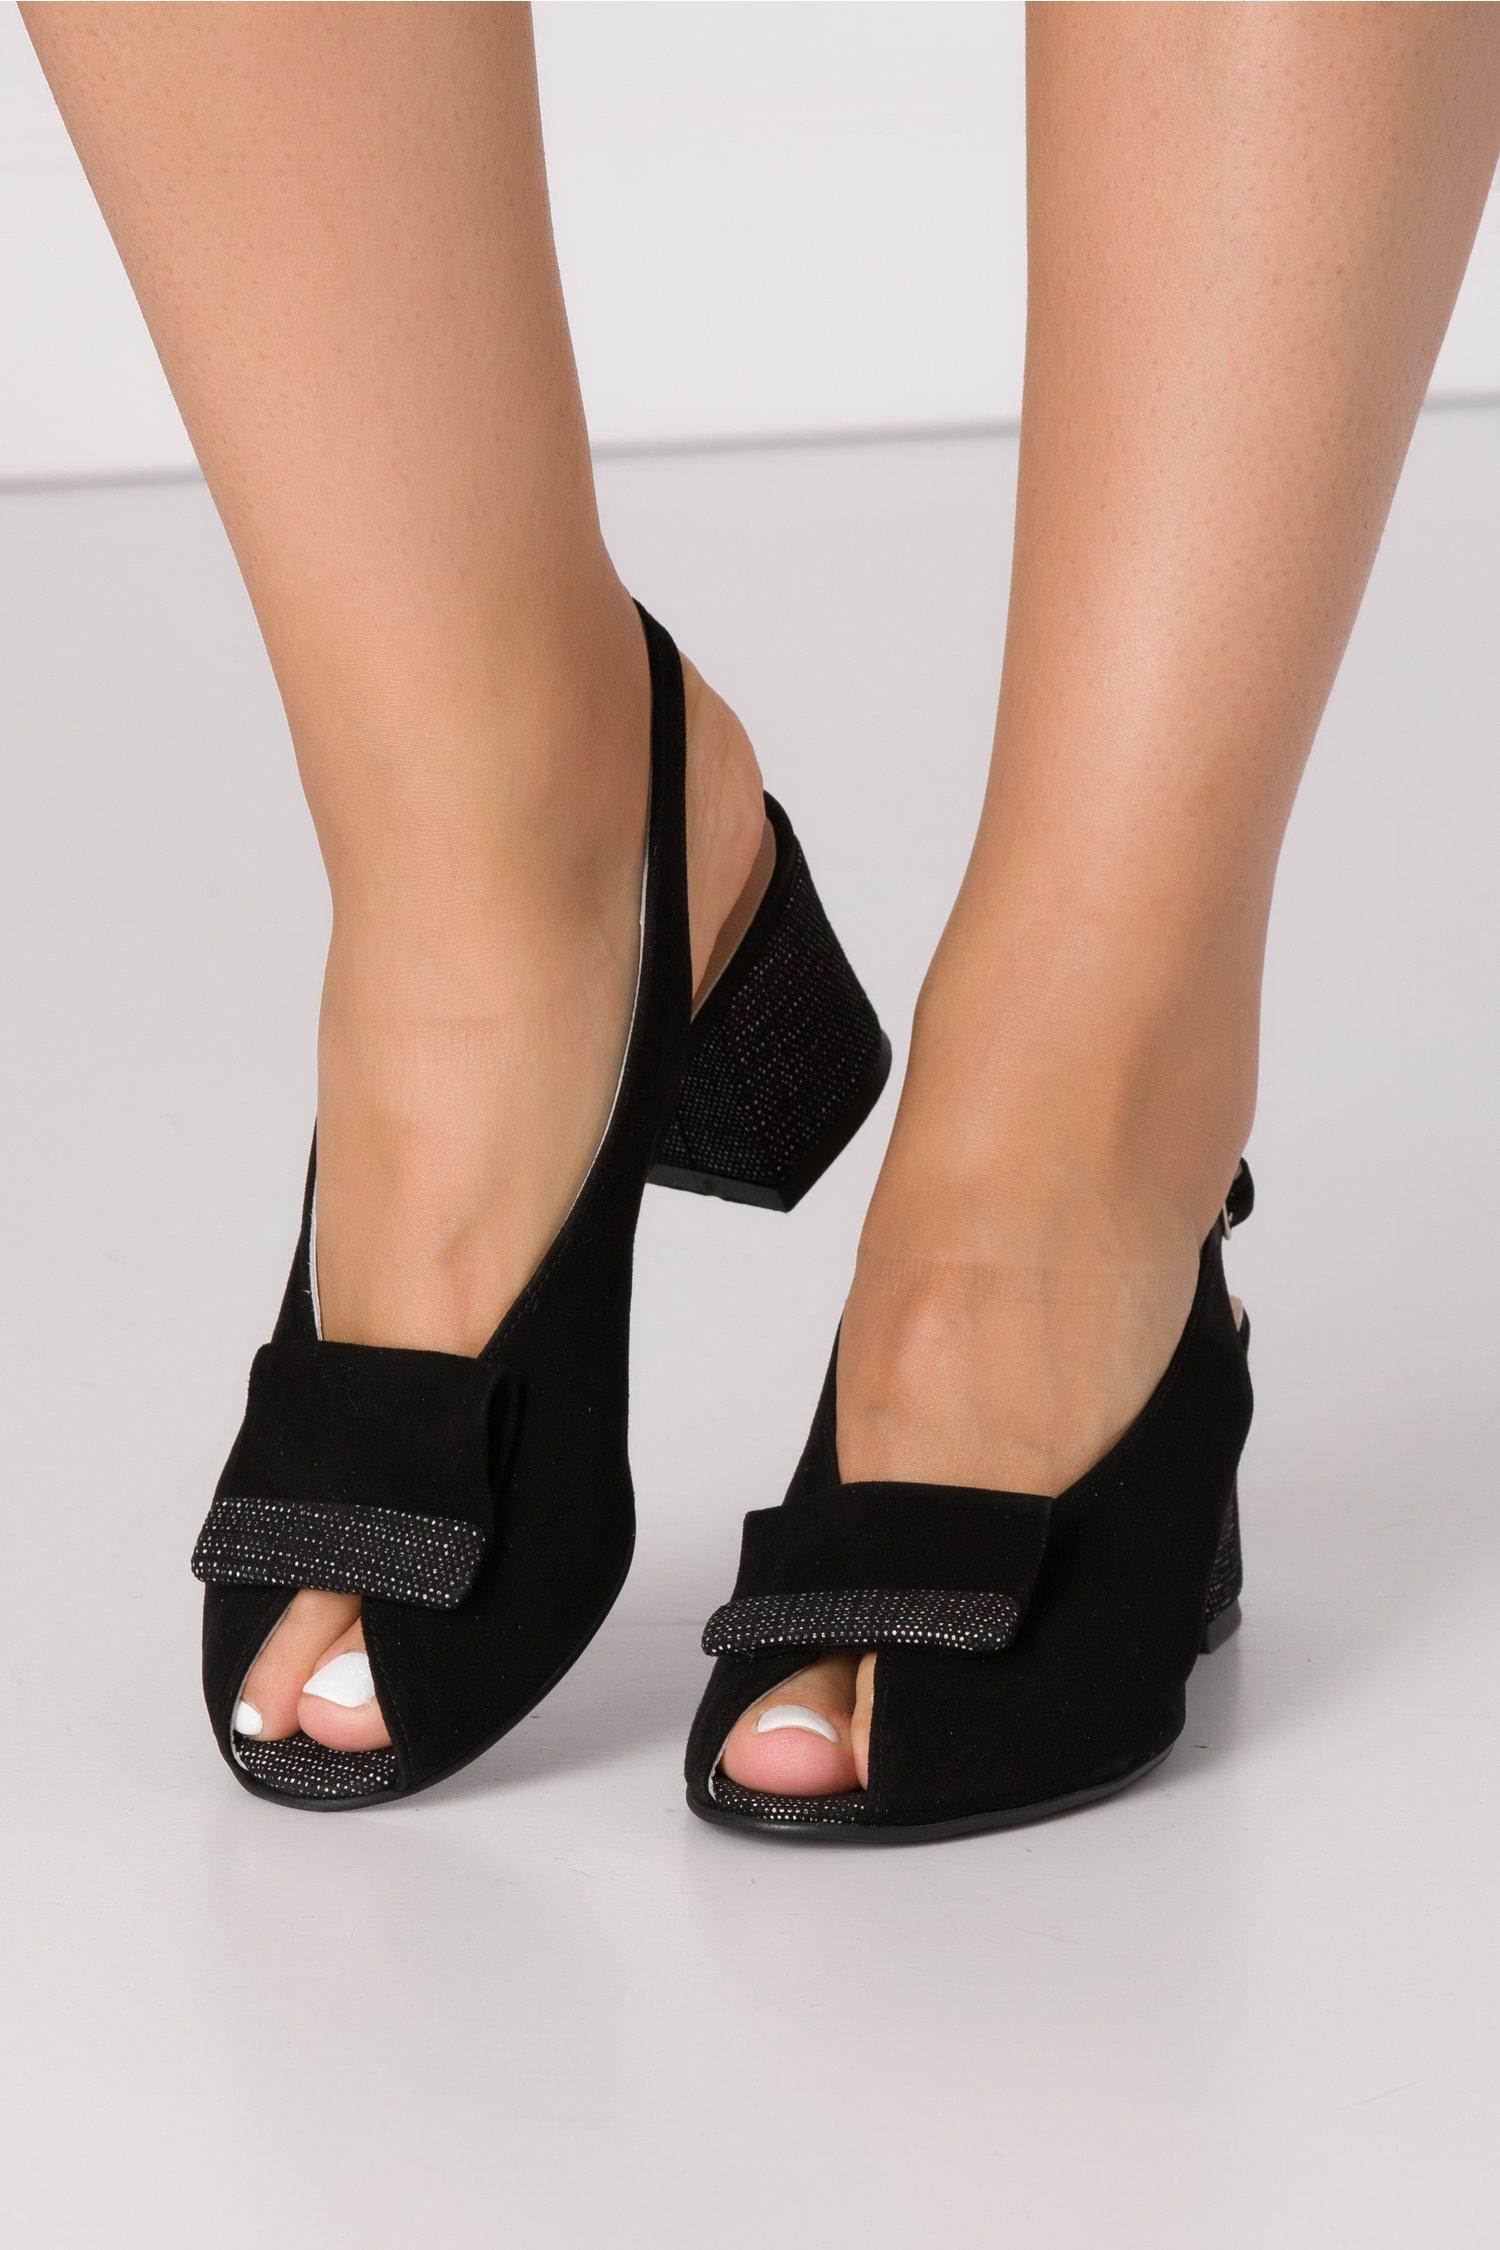 Sandale negre din piele intoarsa cu imprimeu alb-negru cu picatele